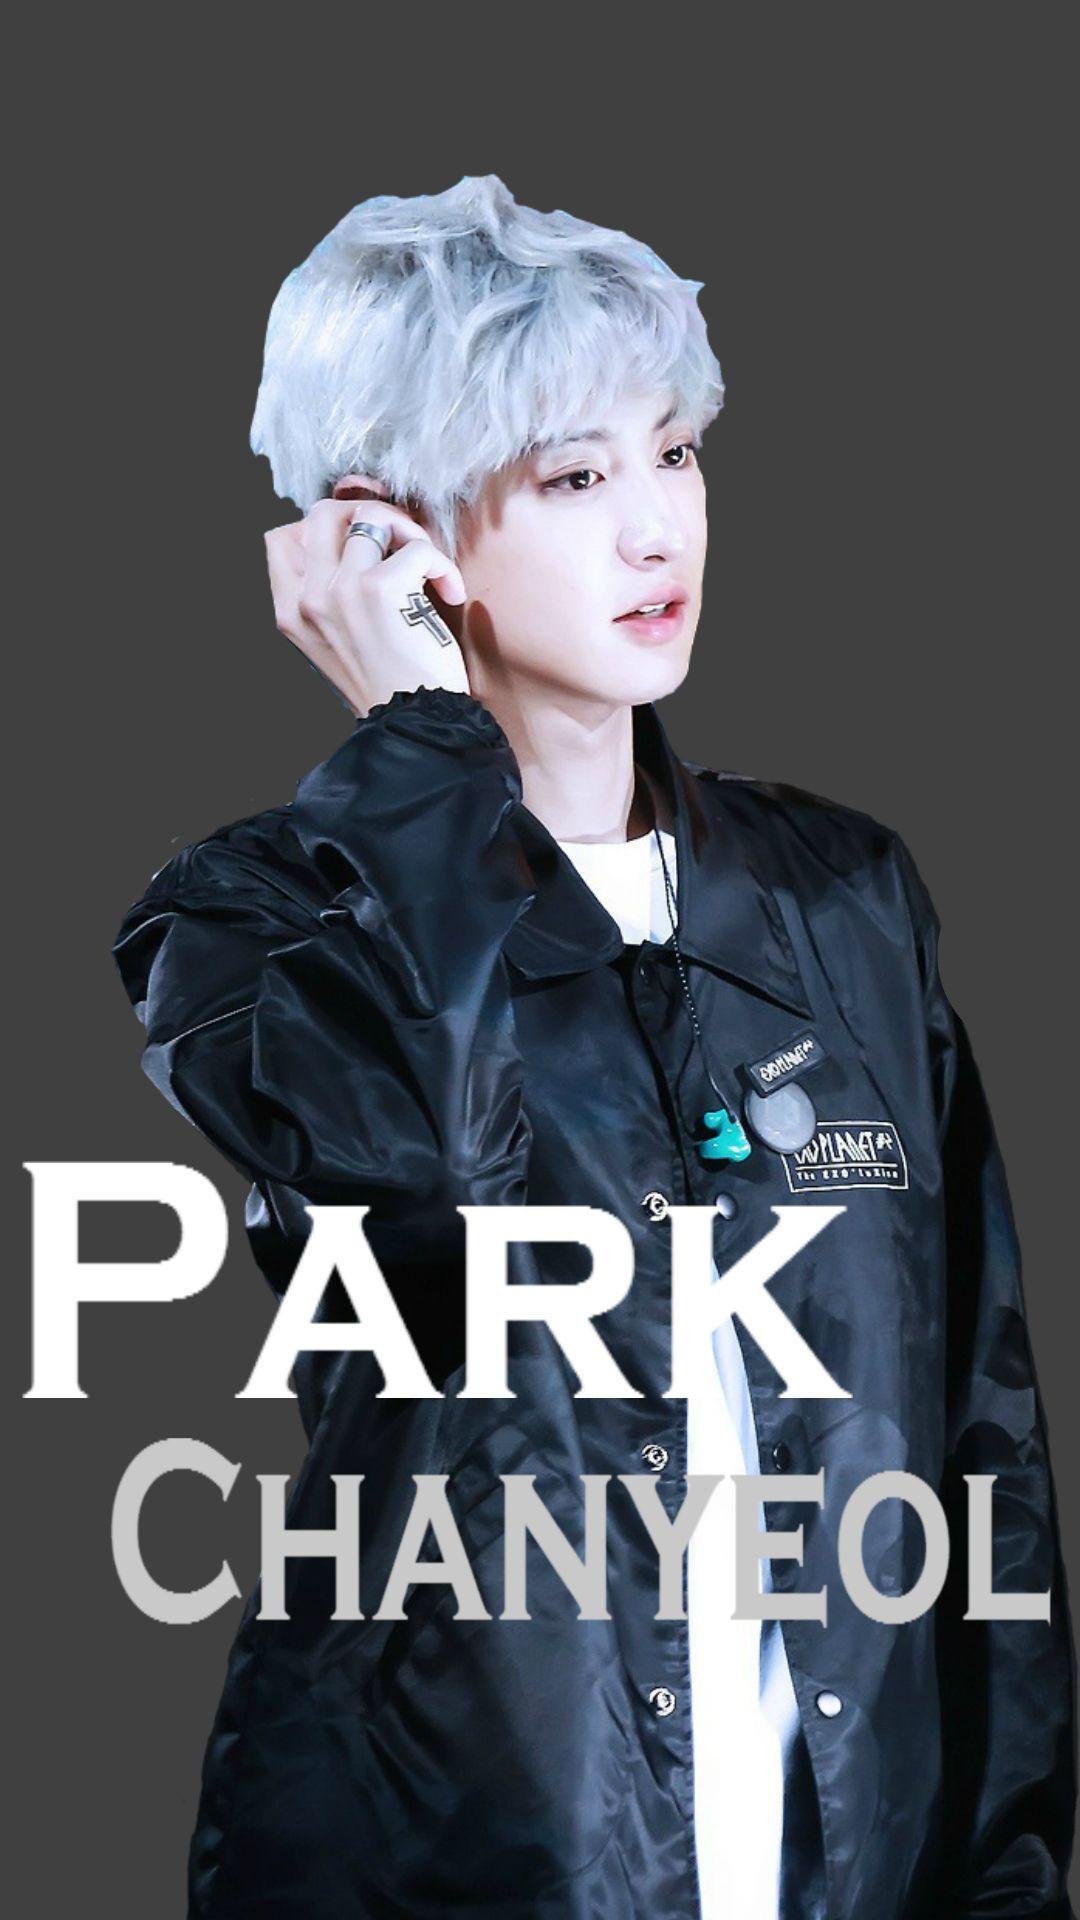 Chanyeol Phone Wallpaper Background Kpop Exo Chanyeol Chanyeol Kpop Super Junior